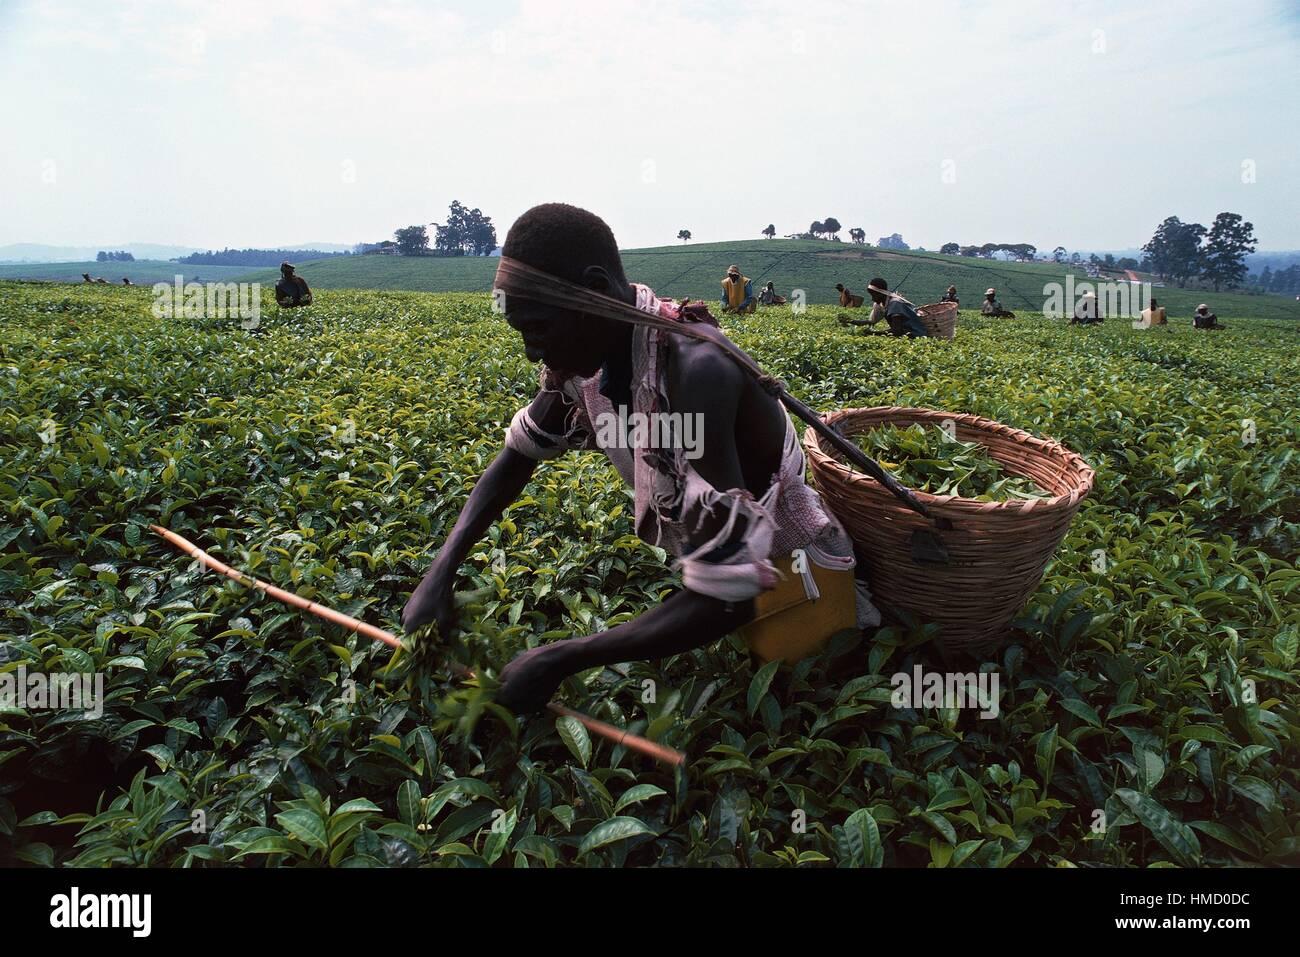 Men collecting tea in baskets tied to their heads on a Kiamara plantation, Uganda. - Stock Image